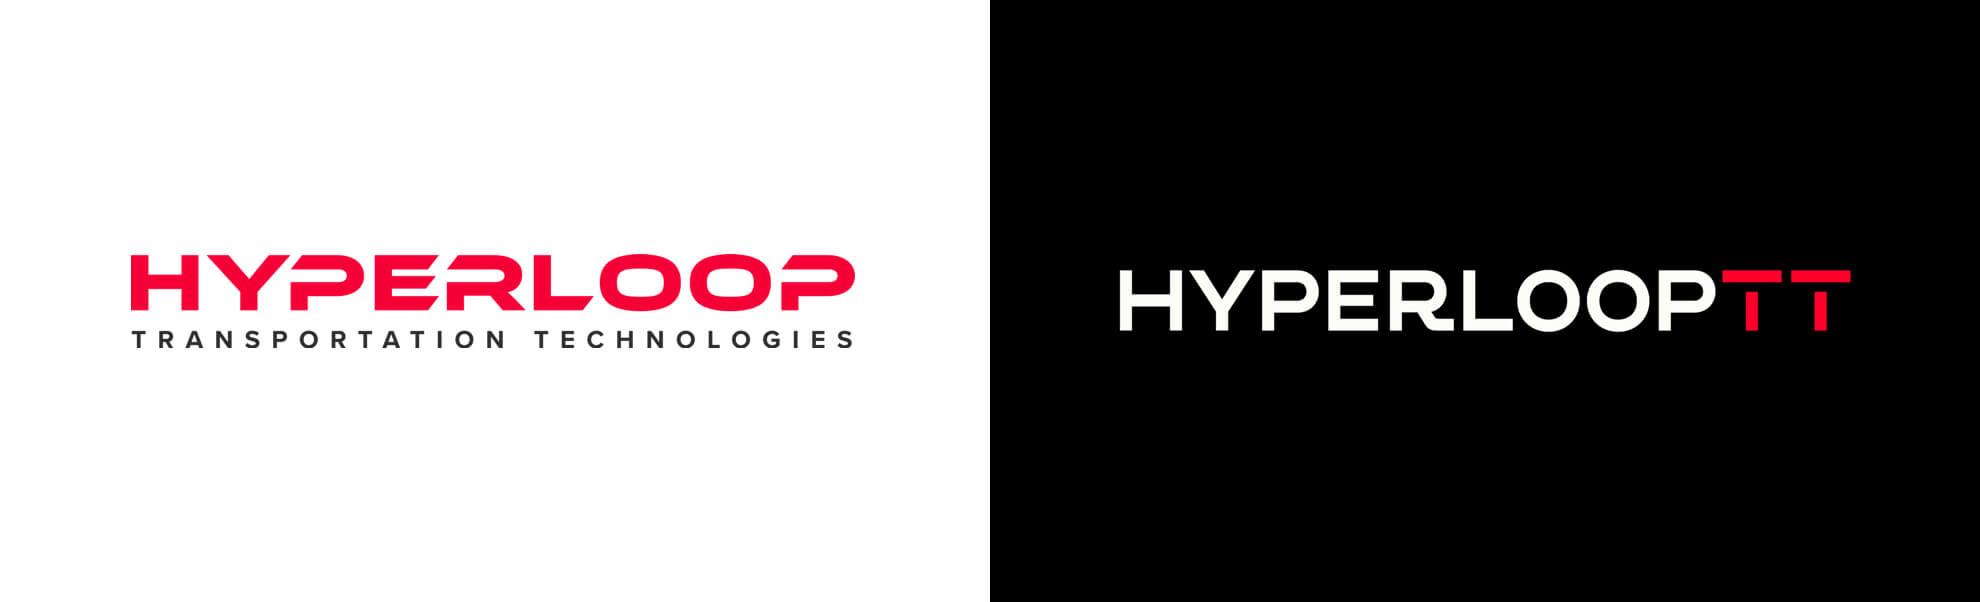 stare inowe logo hyperloop